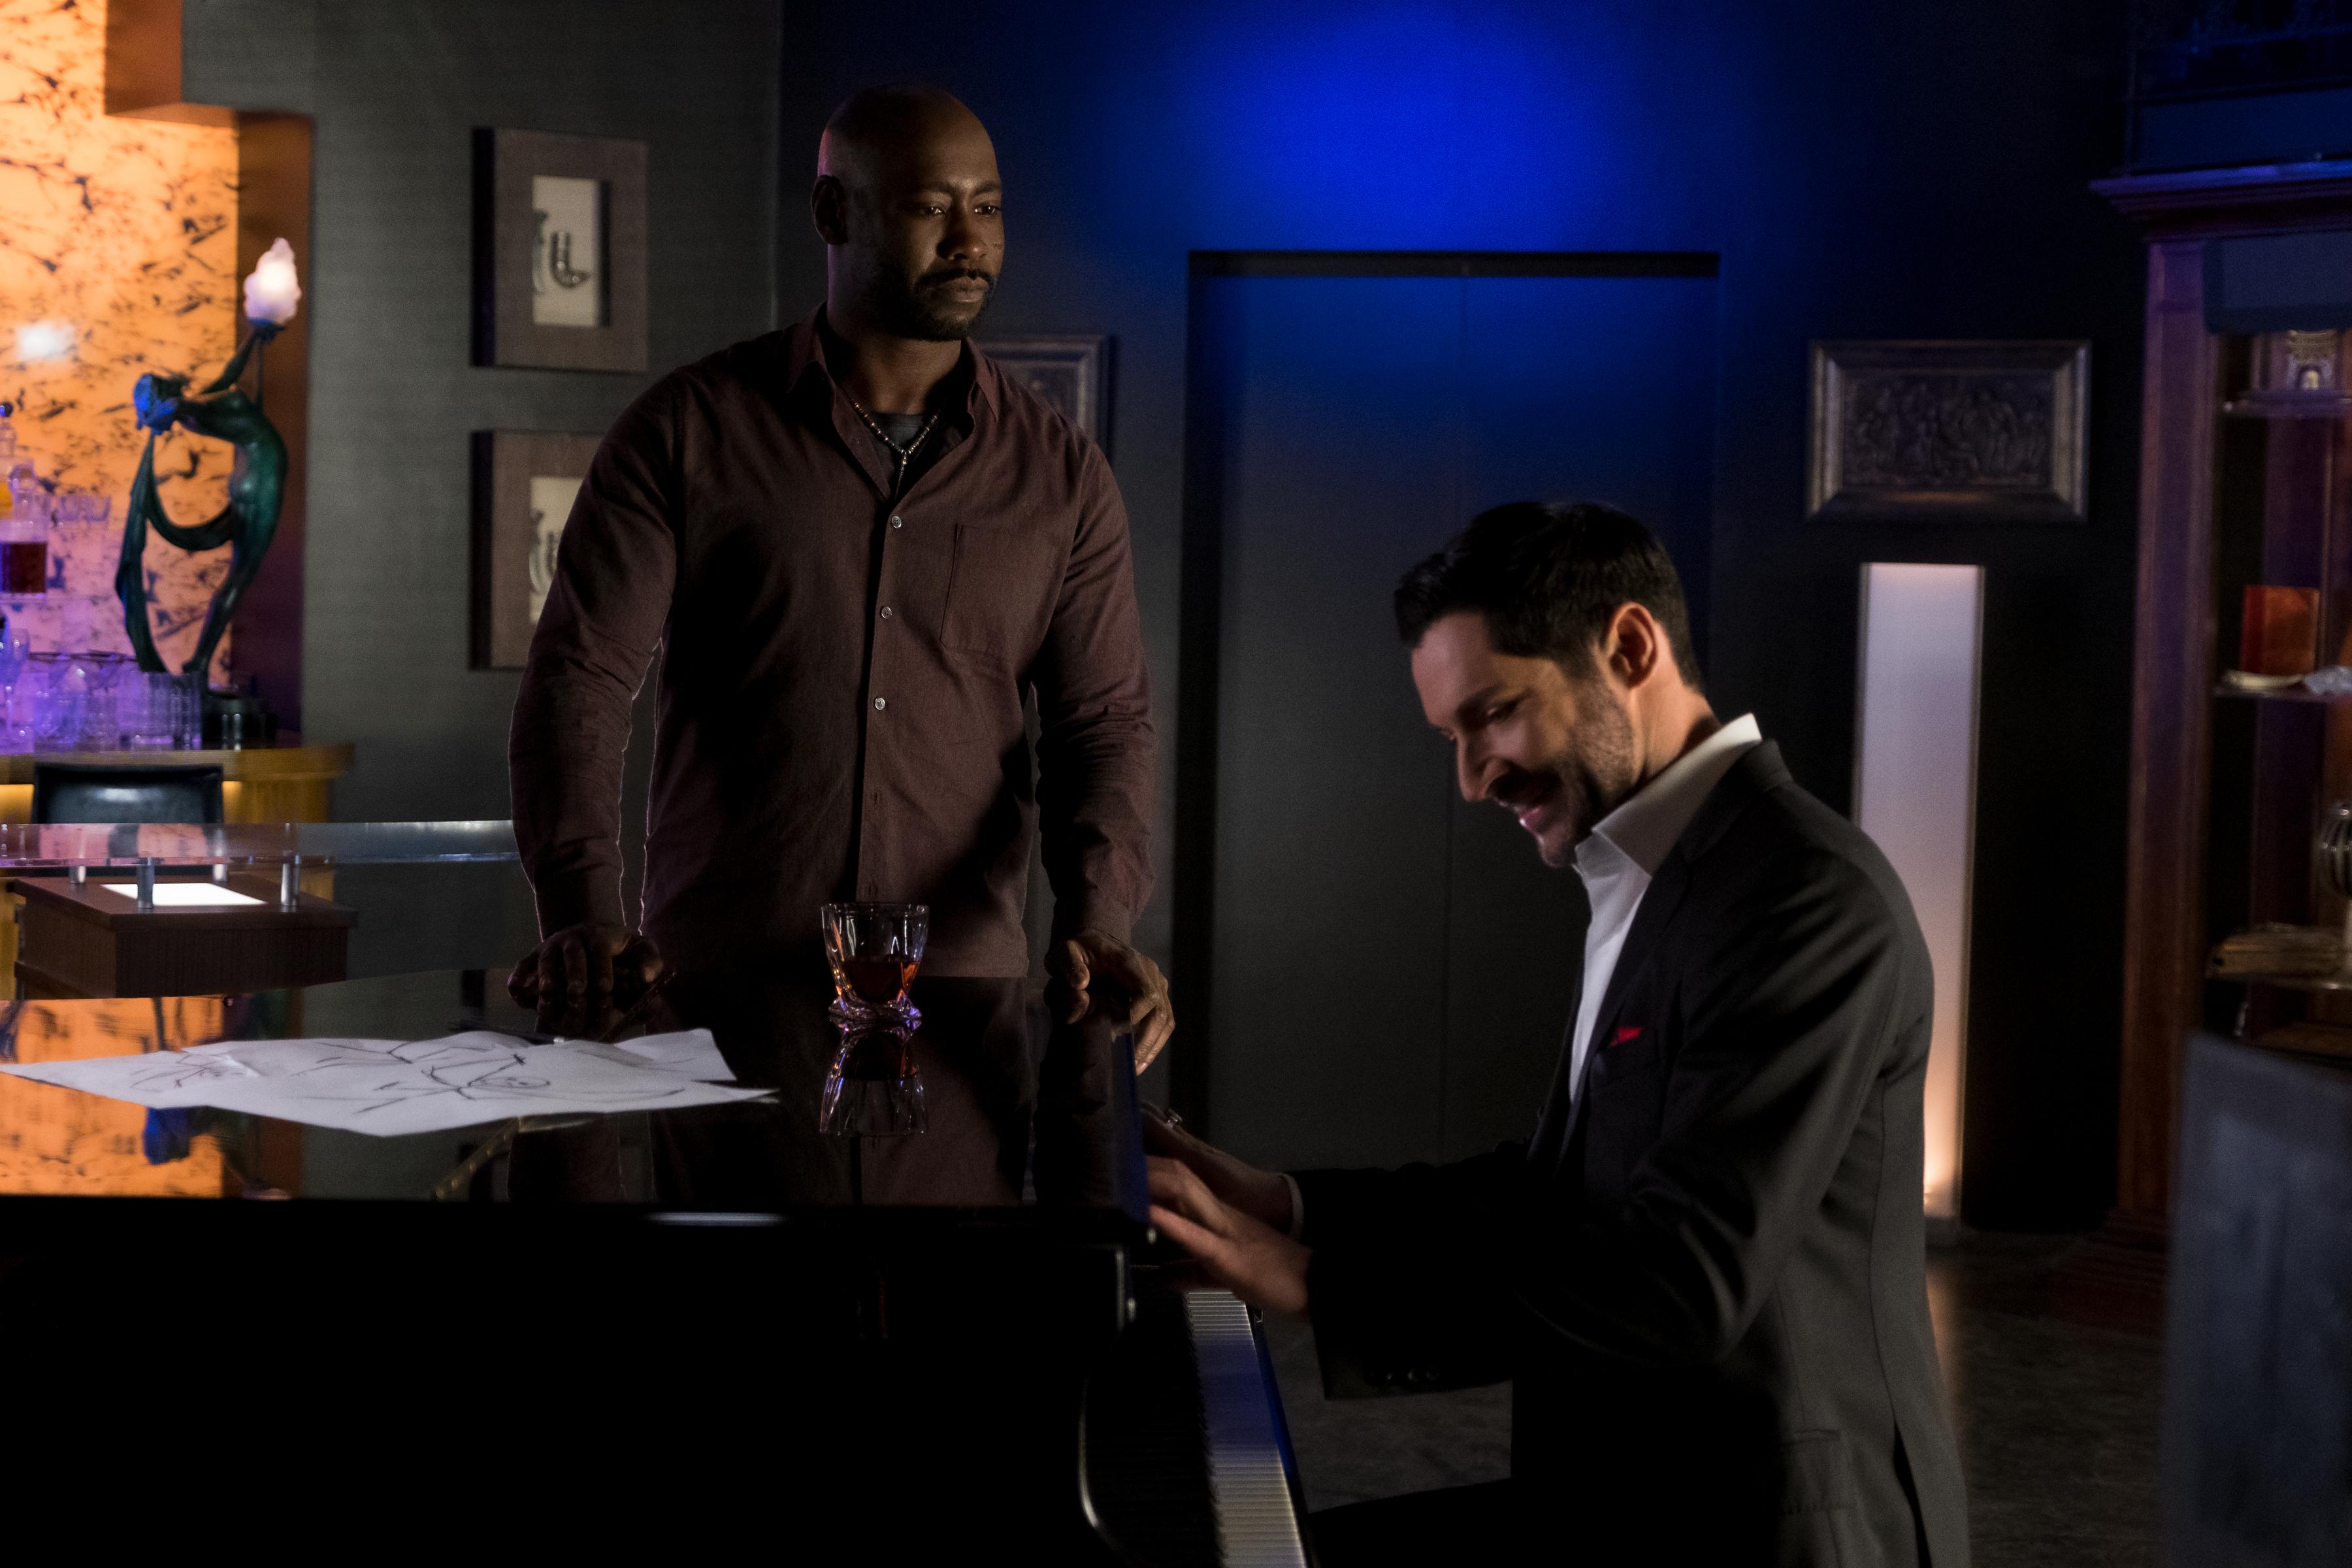 Lucifer Season 5 Dennis Haysbert Cast To Play God